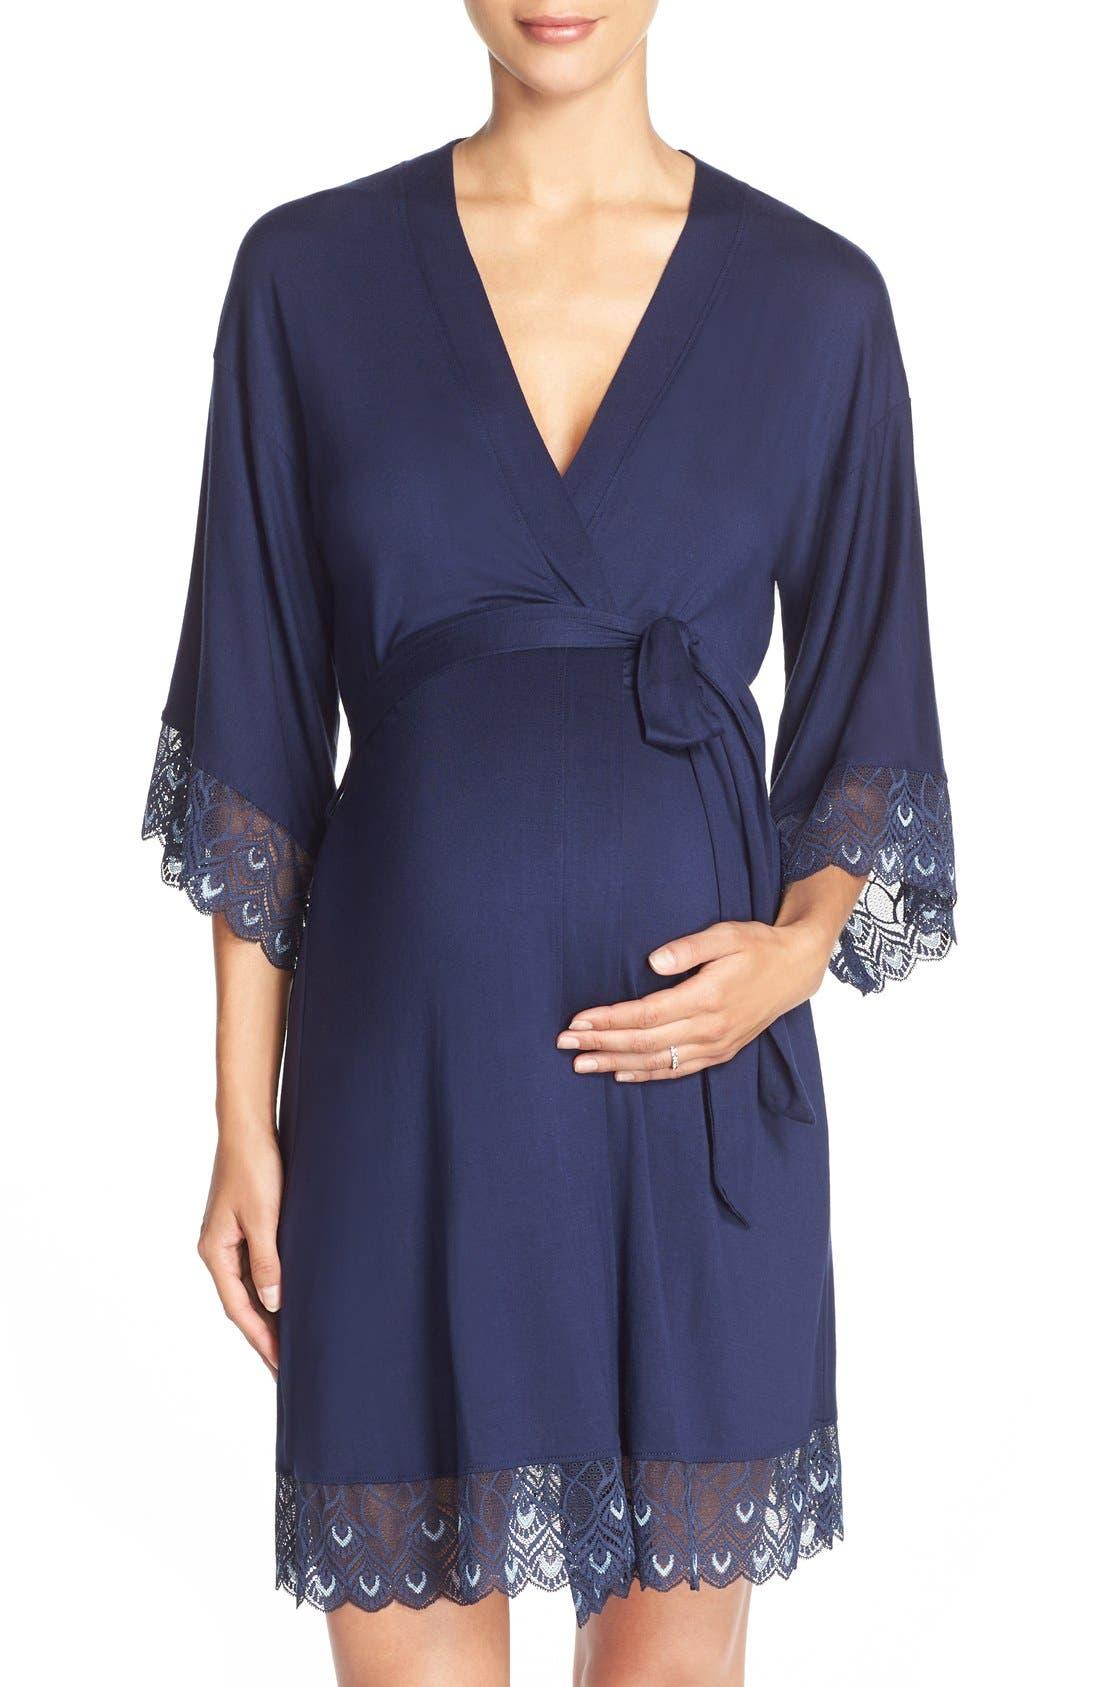 'Tallulah' Maternity Jersey Robe,                             Main thumbnail 1, color,